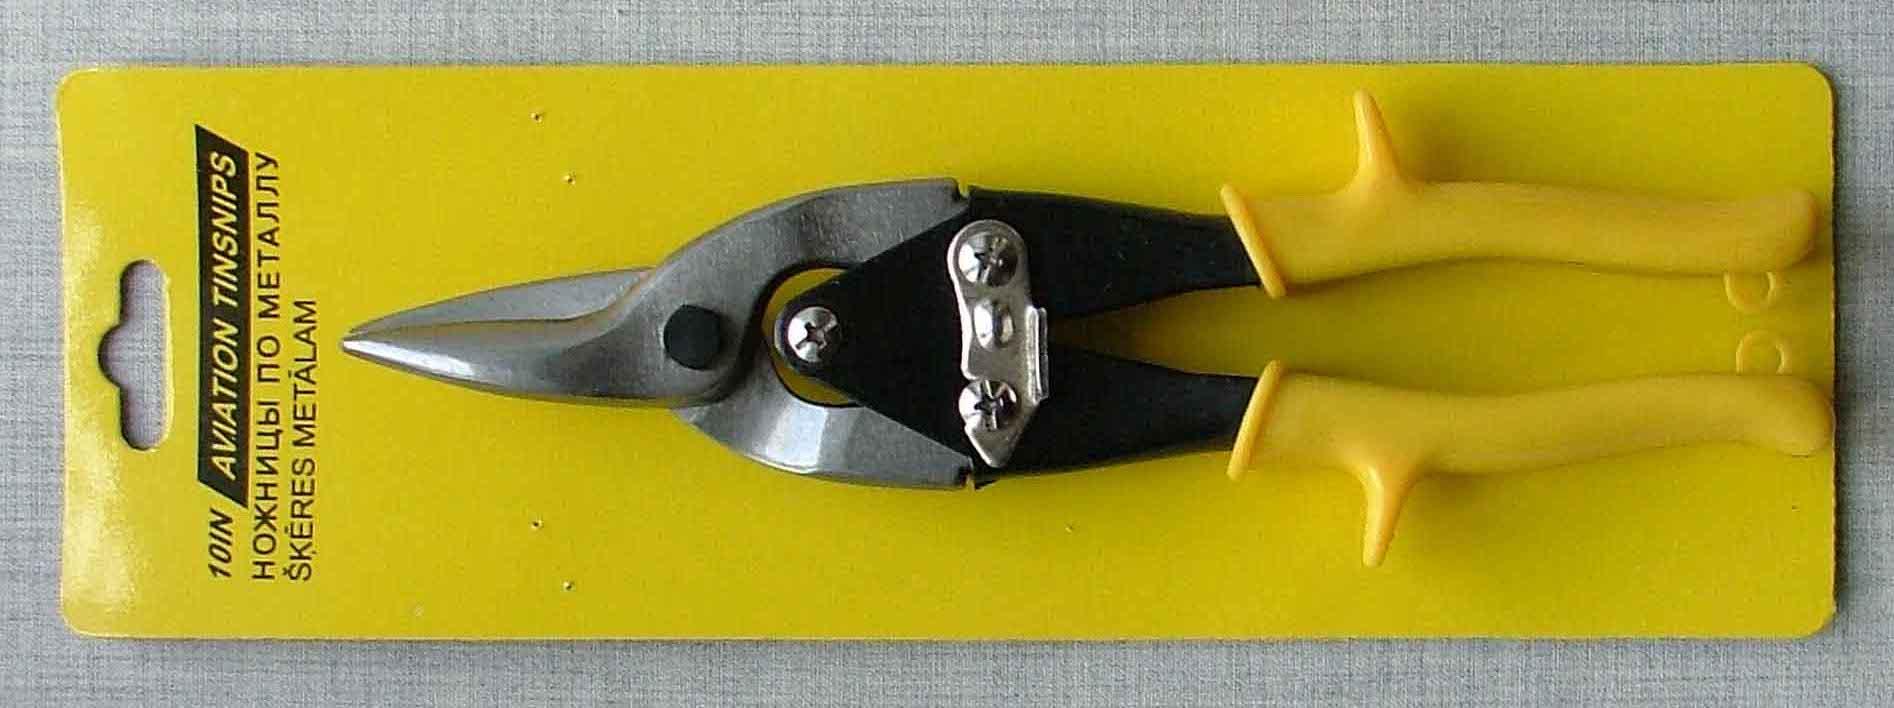 Aviation tinsnip straight Aviation tinsnips